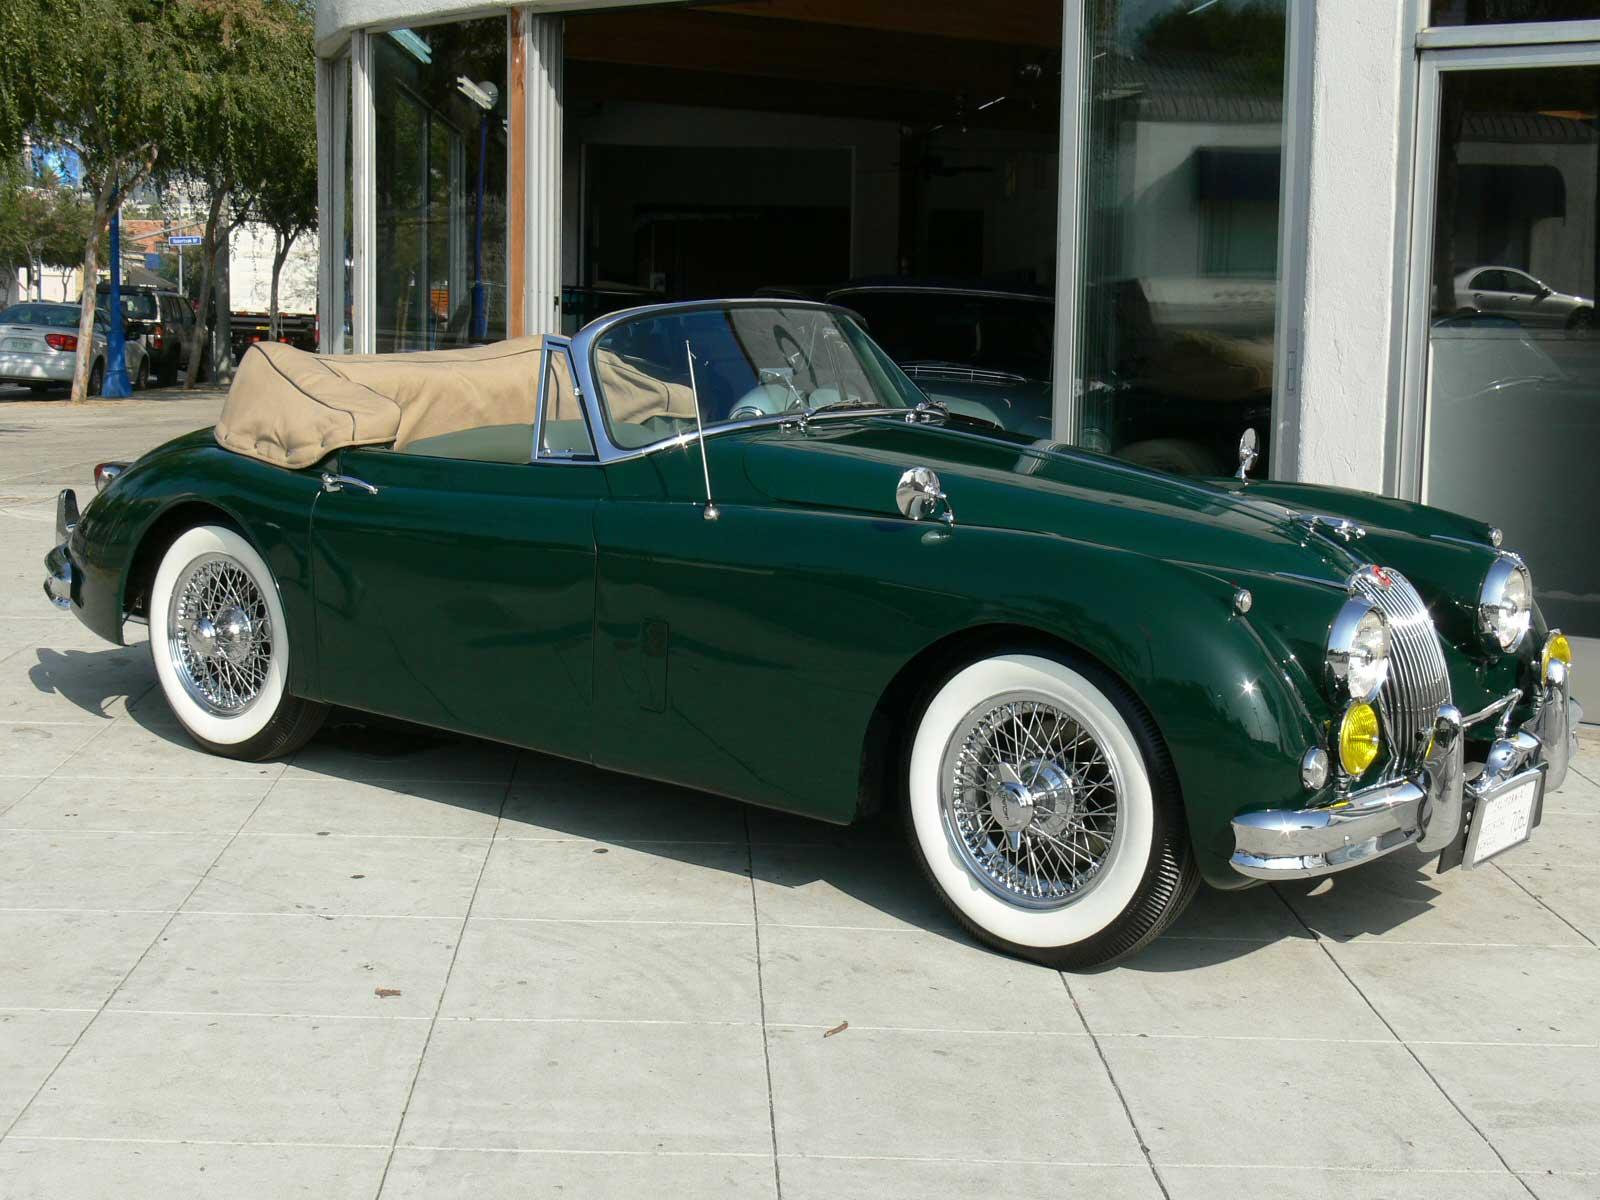 Moss Green Pearl Metallic Car Paint Code